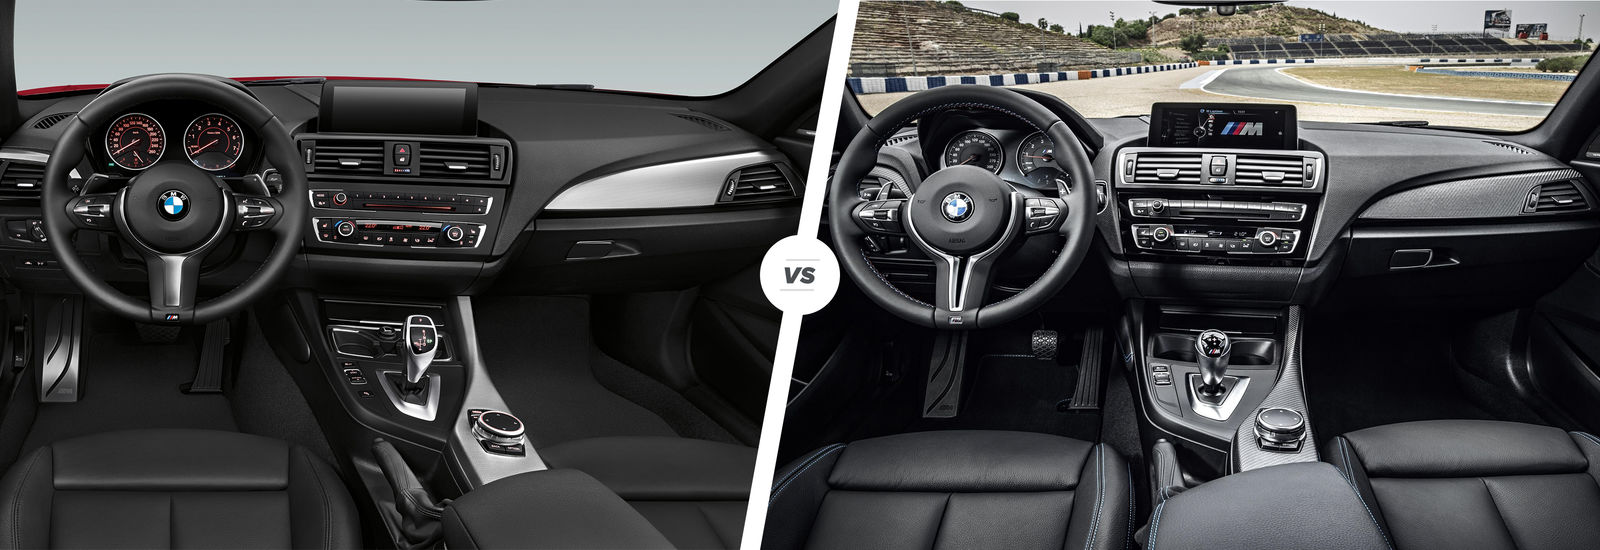 BMW M235i Vs M2 Interior